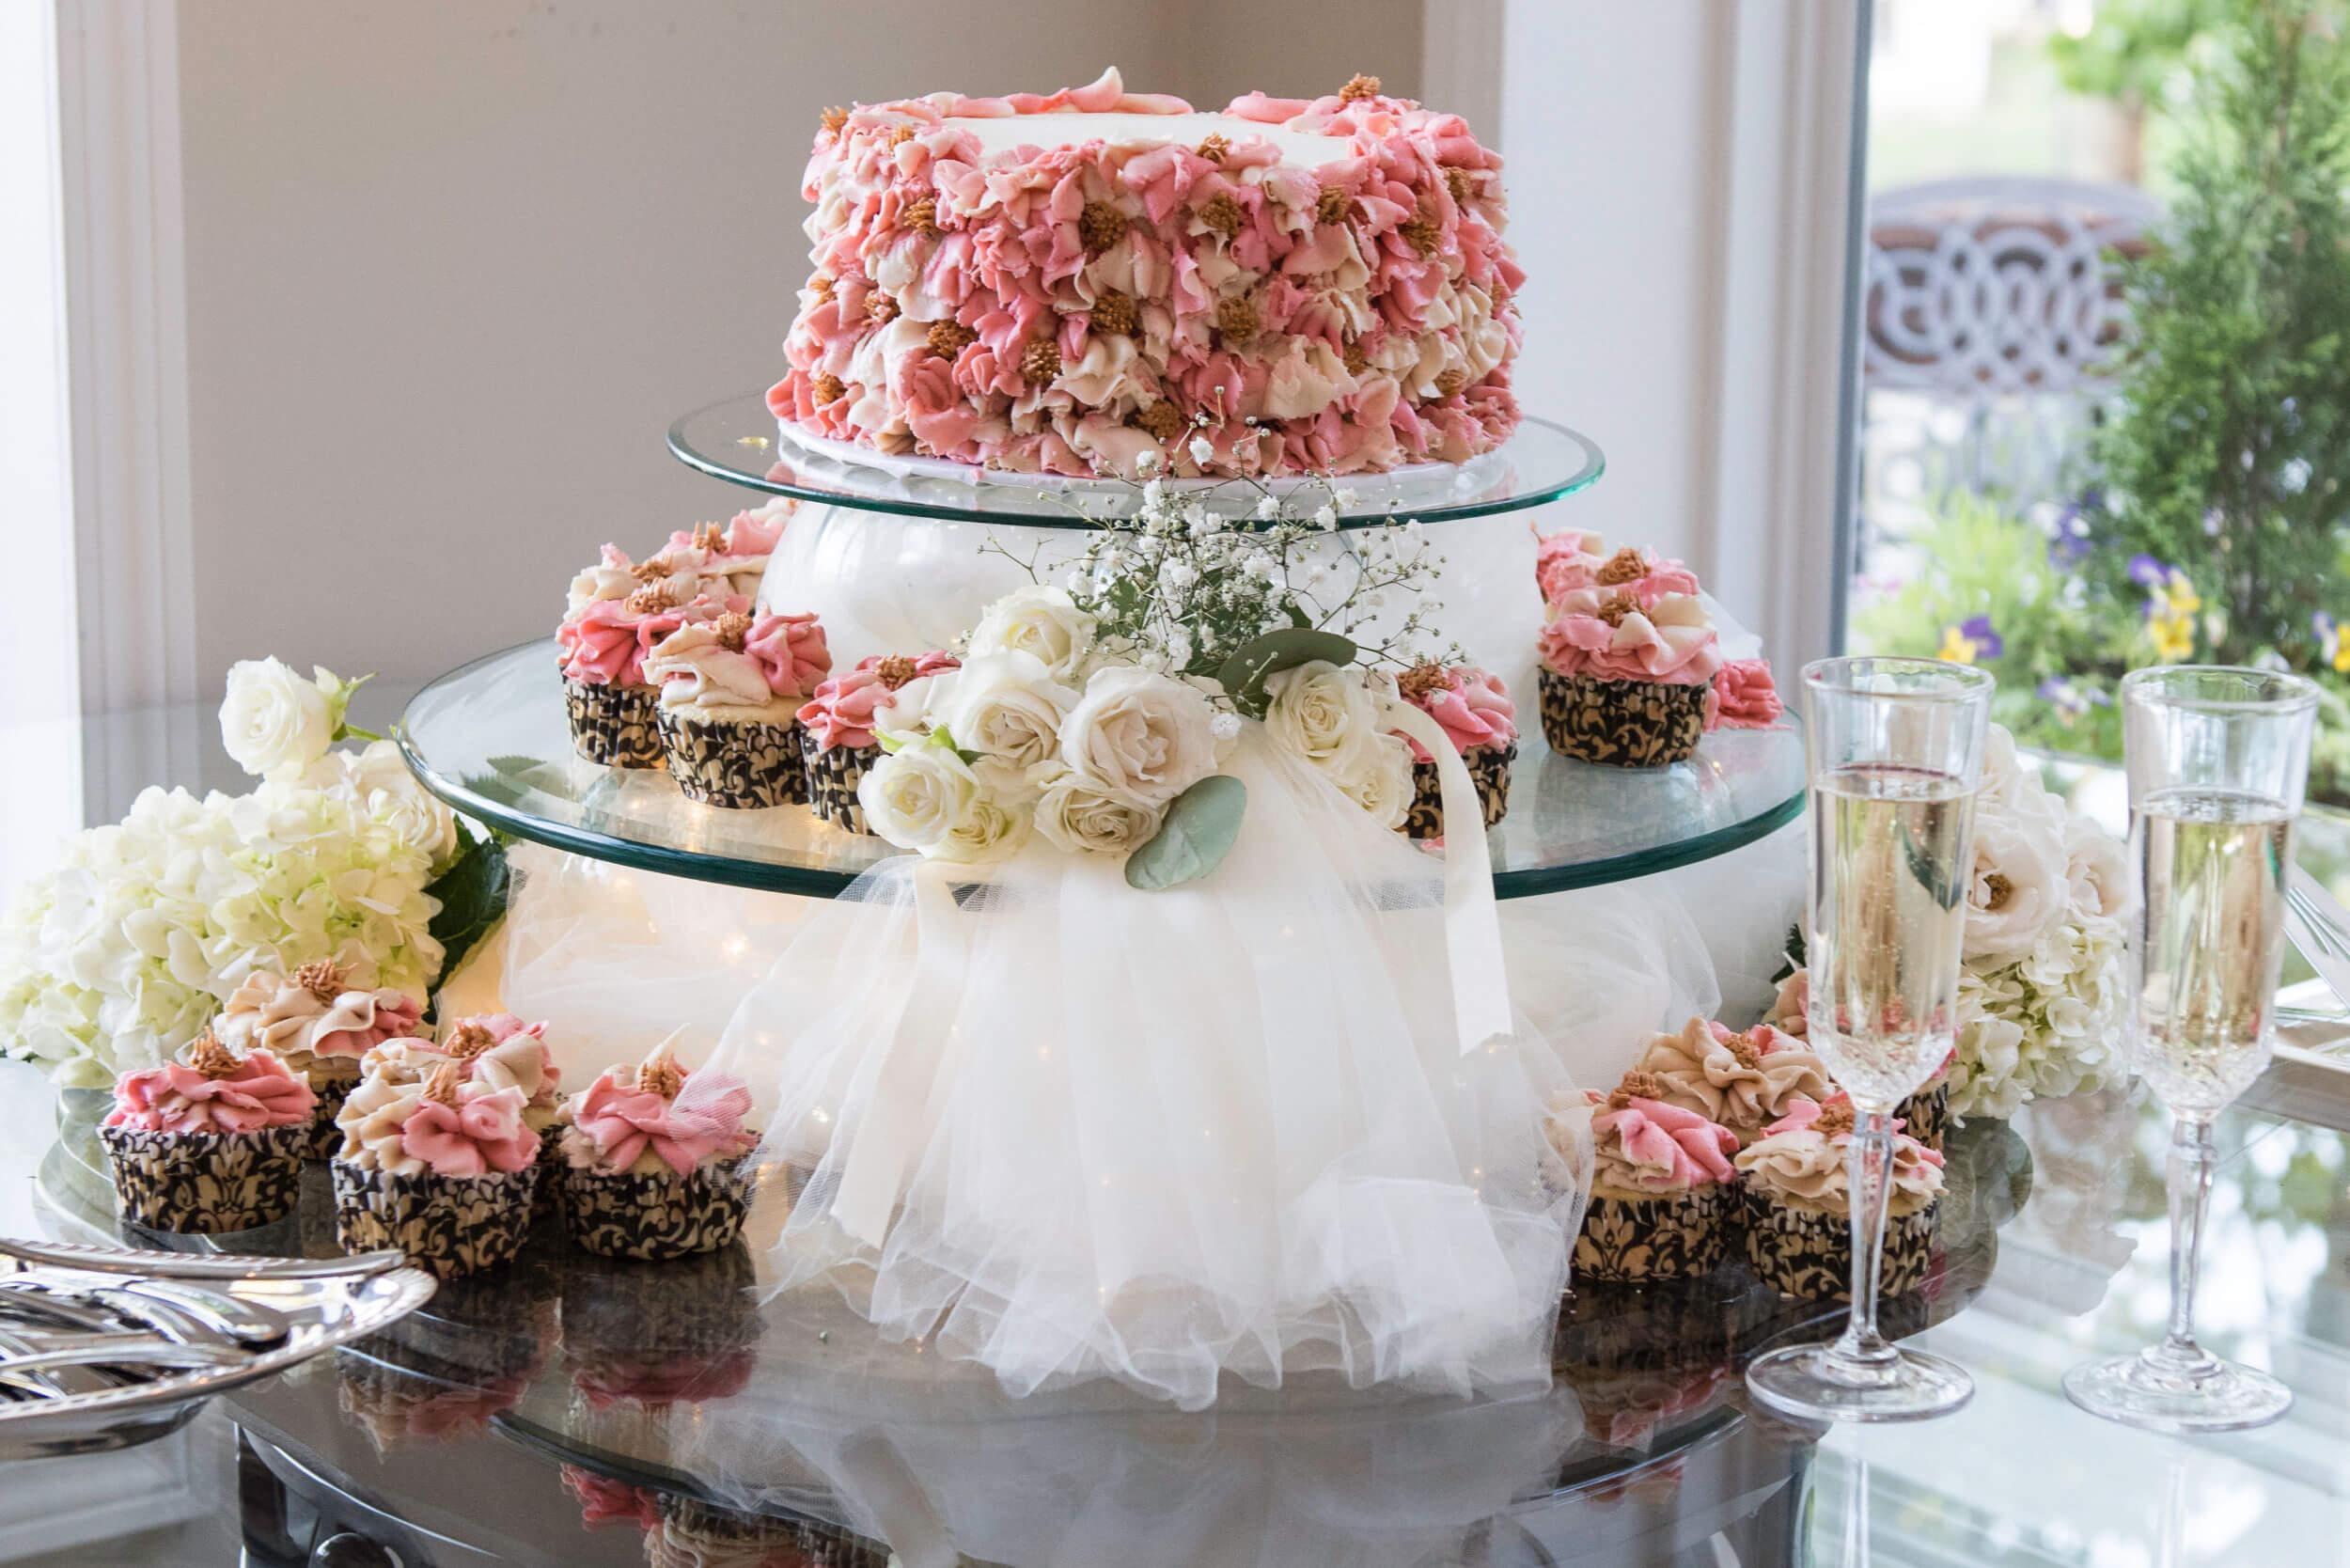 River_Rest_Weddings_Website-Book-Cake.jpg